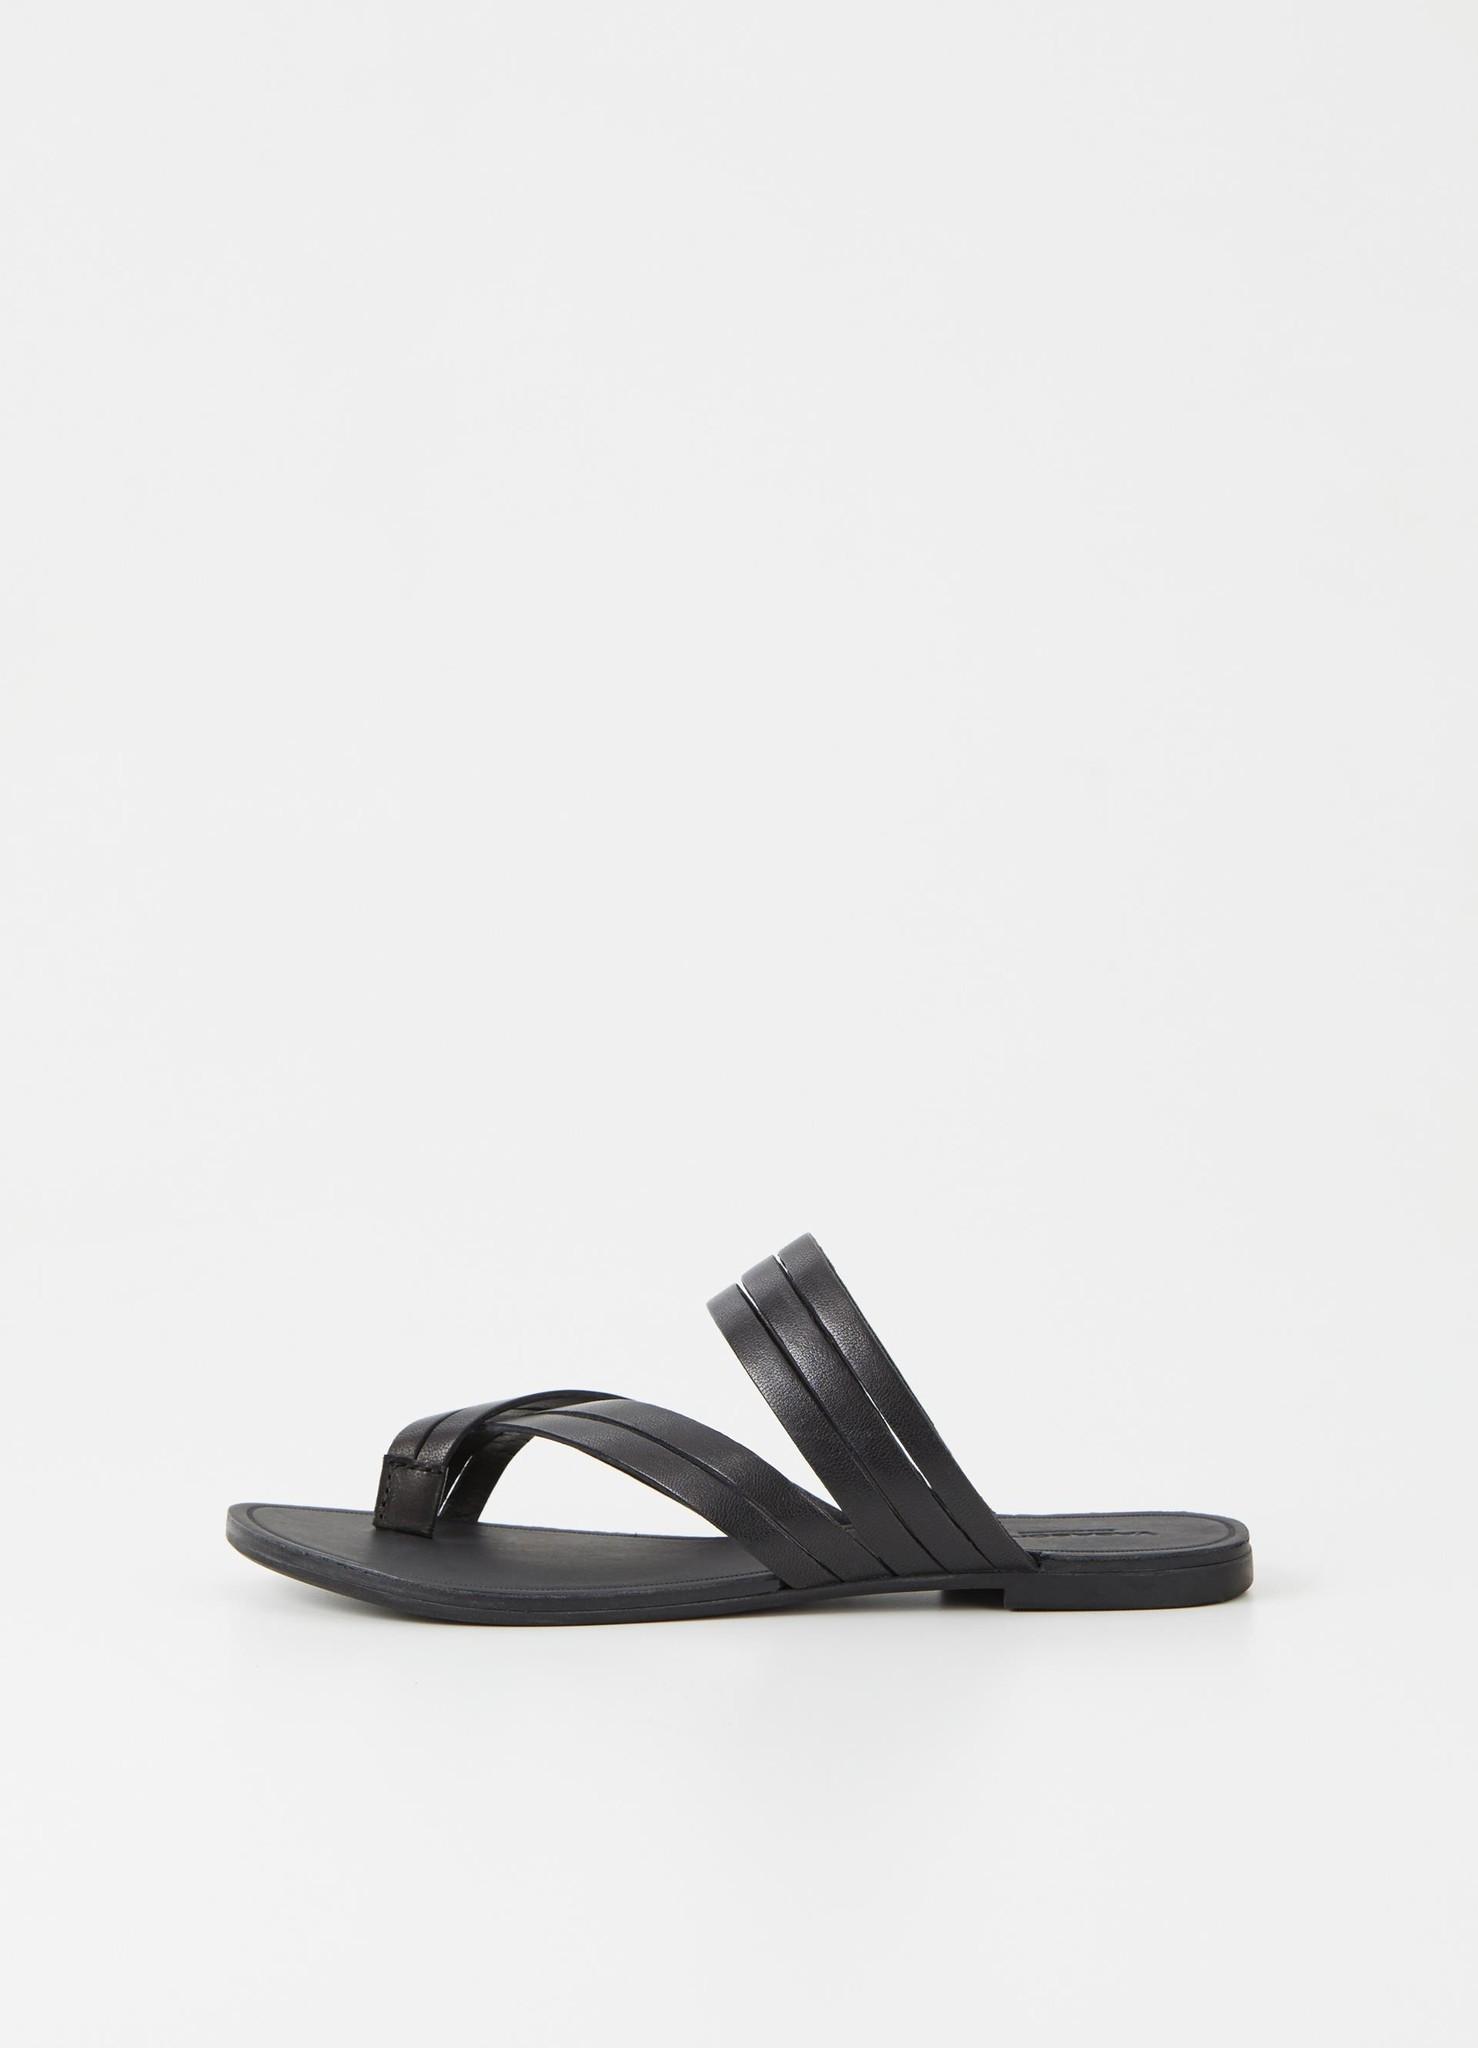 Tia Low Black Leather Sandals-1